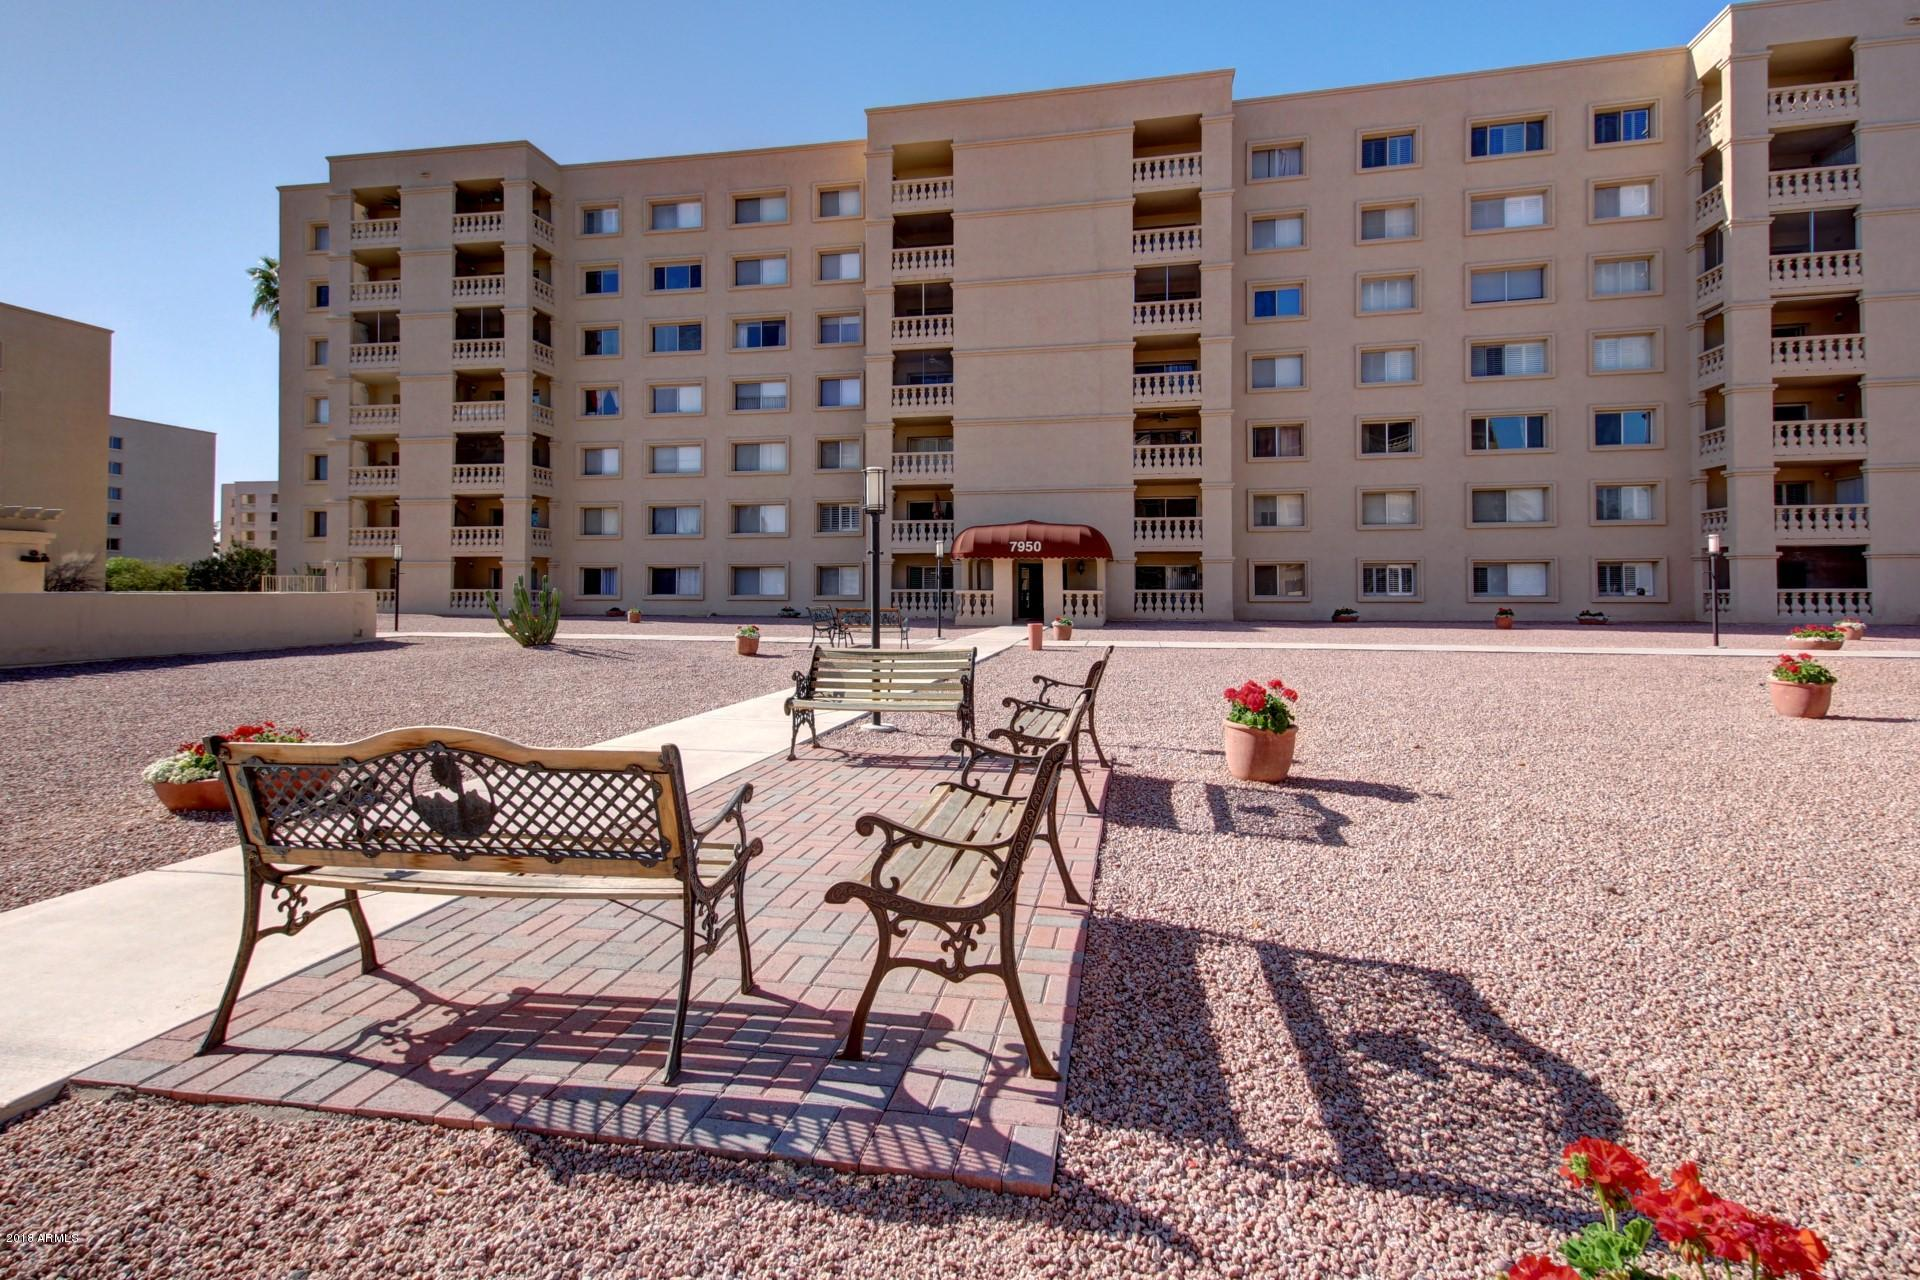 MLS 5821004 7920 E CAMELBACK Road Unit 408, Scottsdale, AZ 85251 Scottsdale AZ Scottsdale Shadows